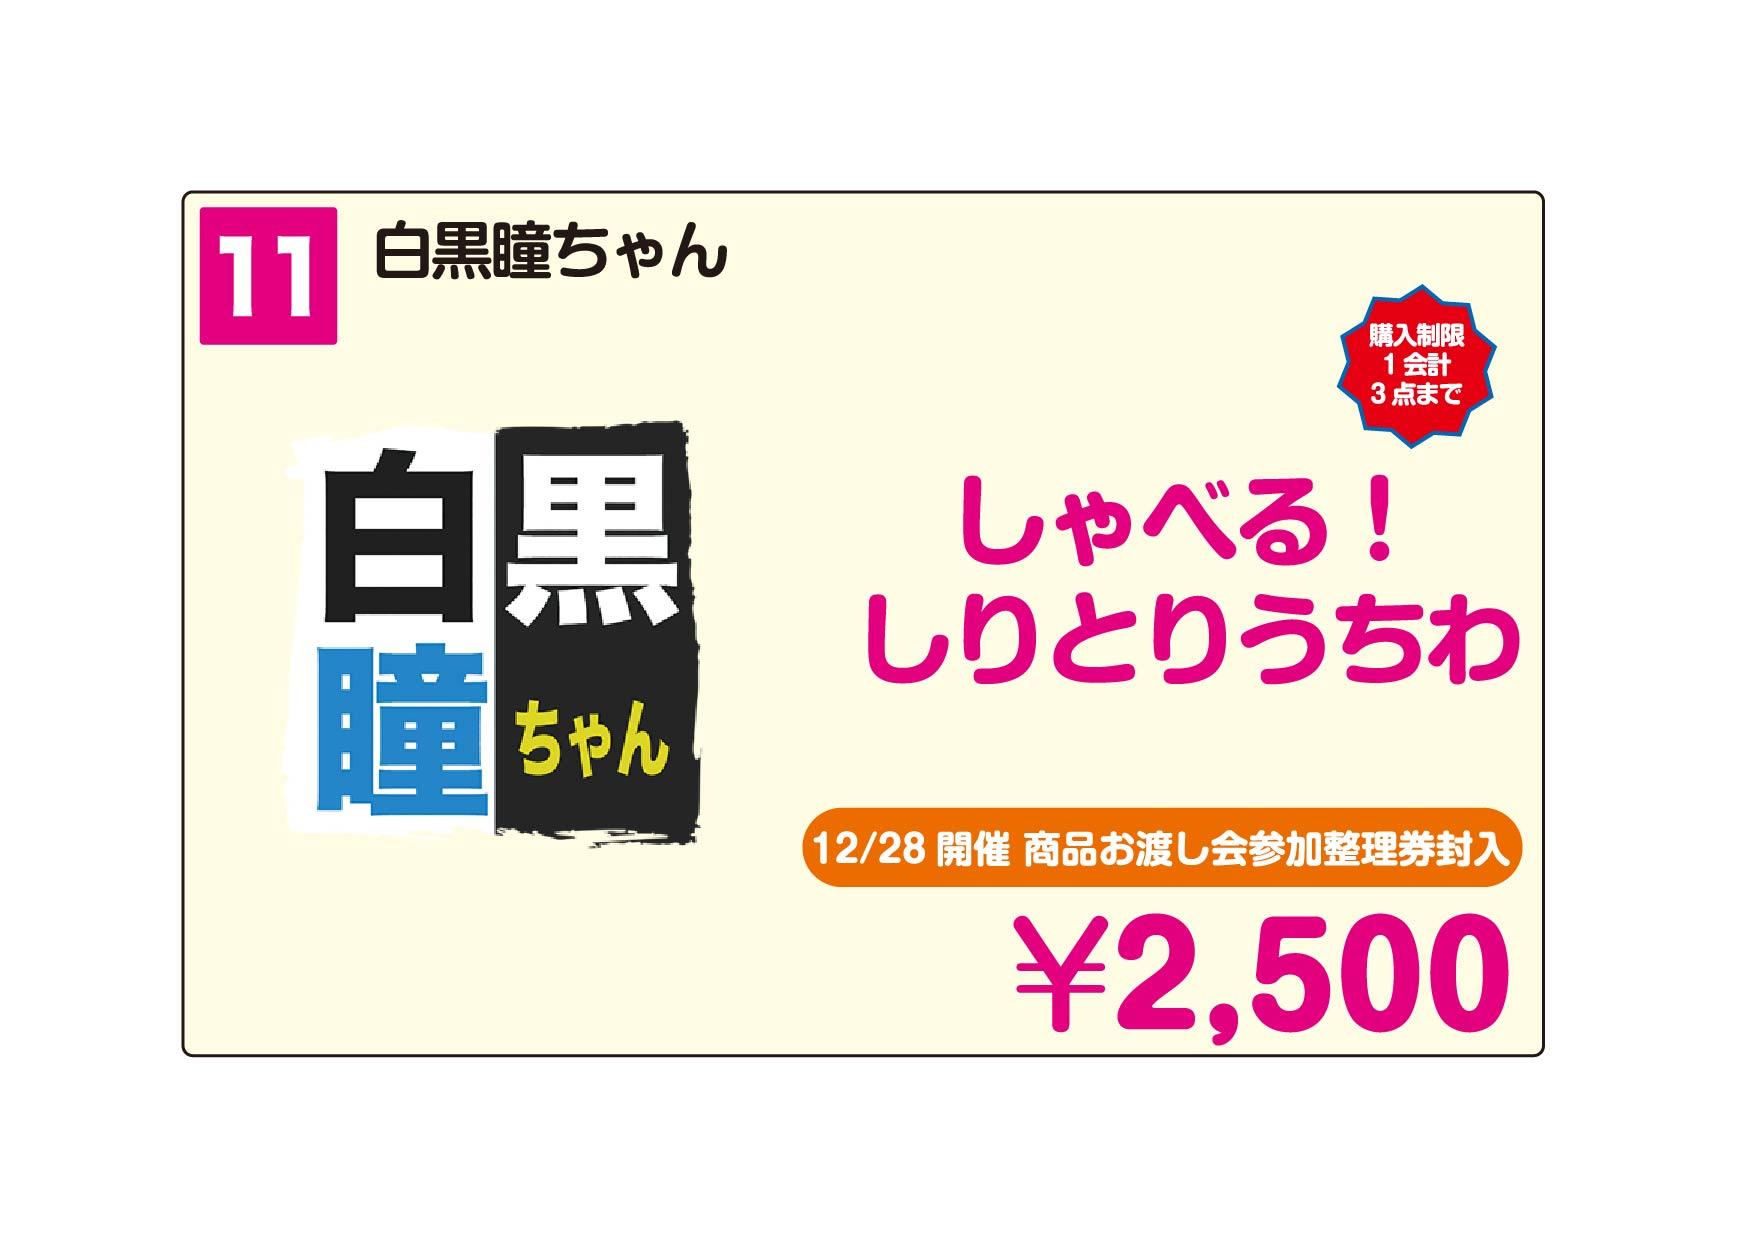 http://www.joqr.co.jp/AandG_booth/11.jpg